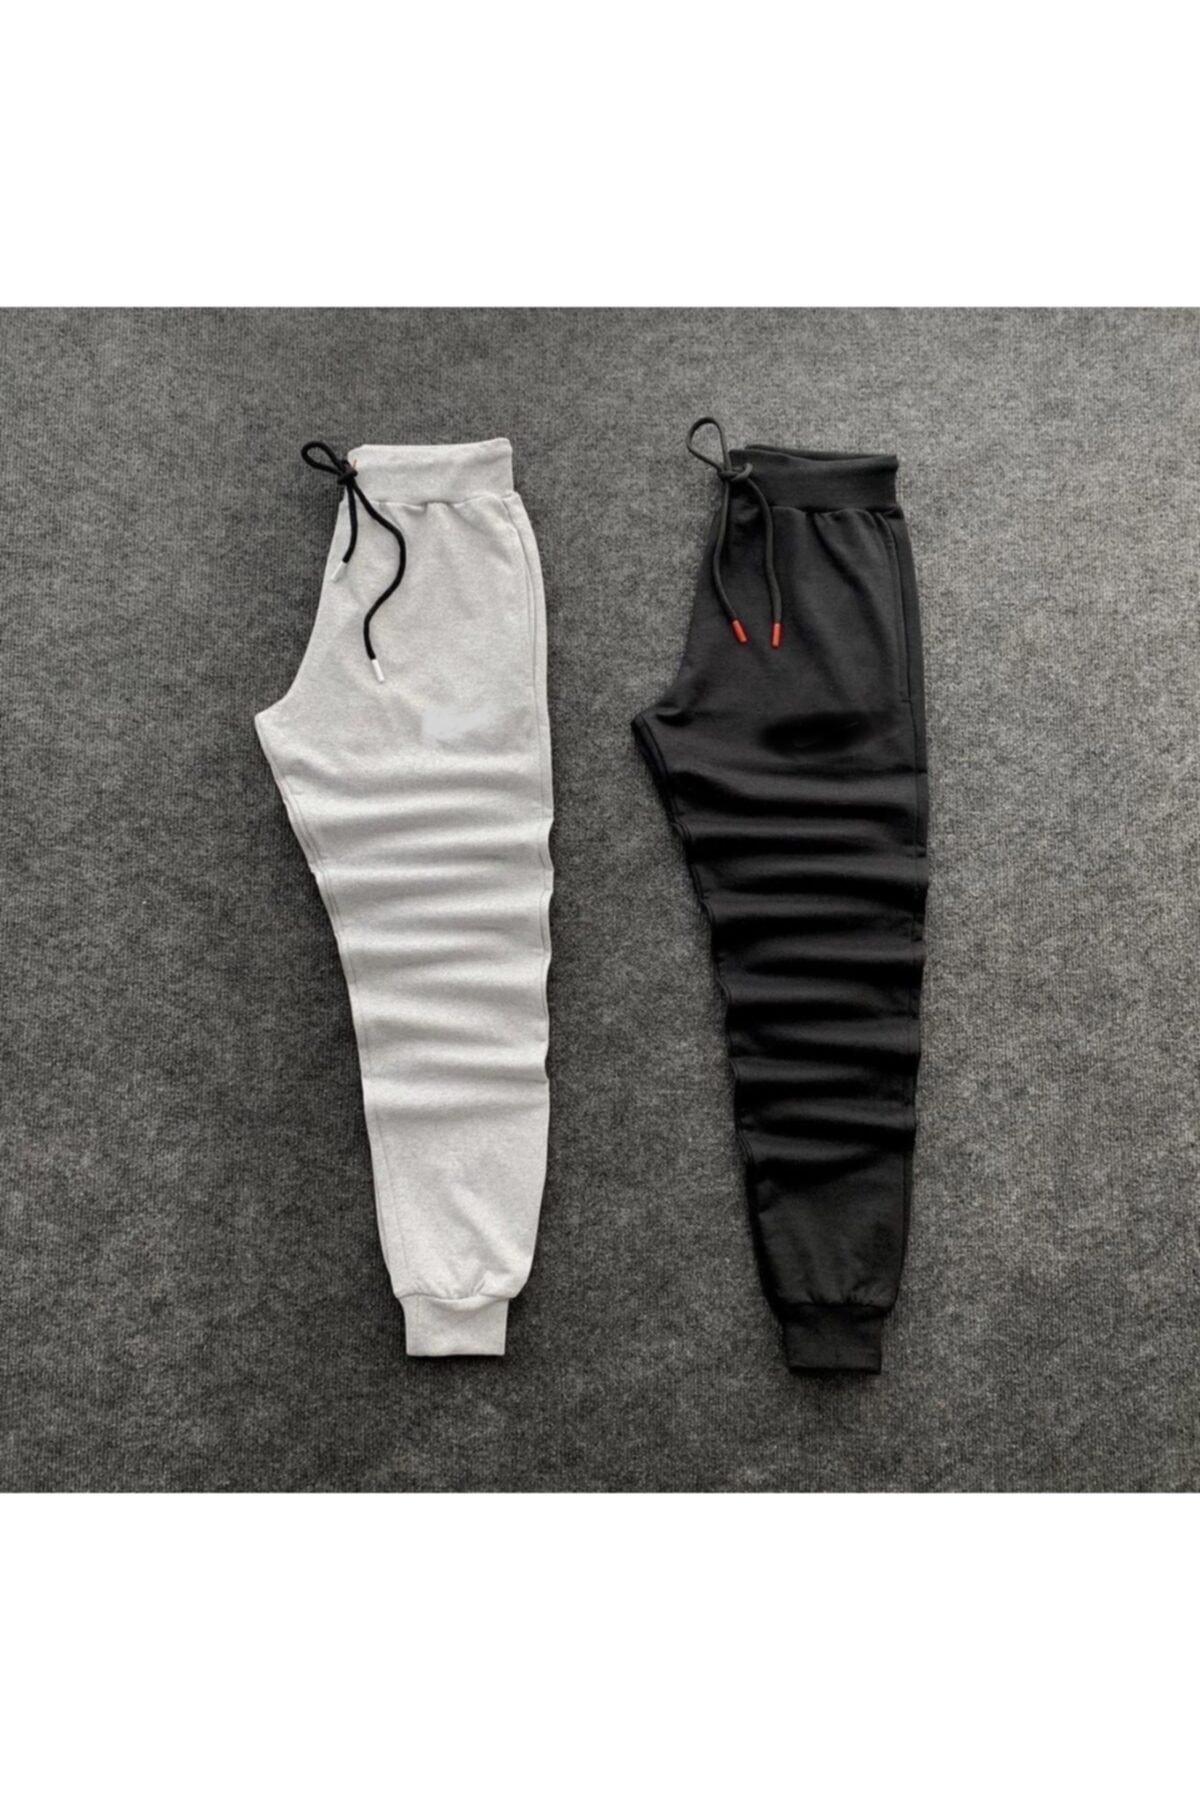 Unisex Gri-siyah Slim Fit Çift Eşofman